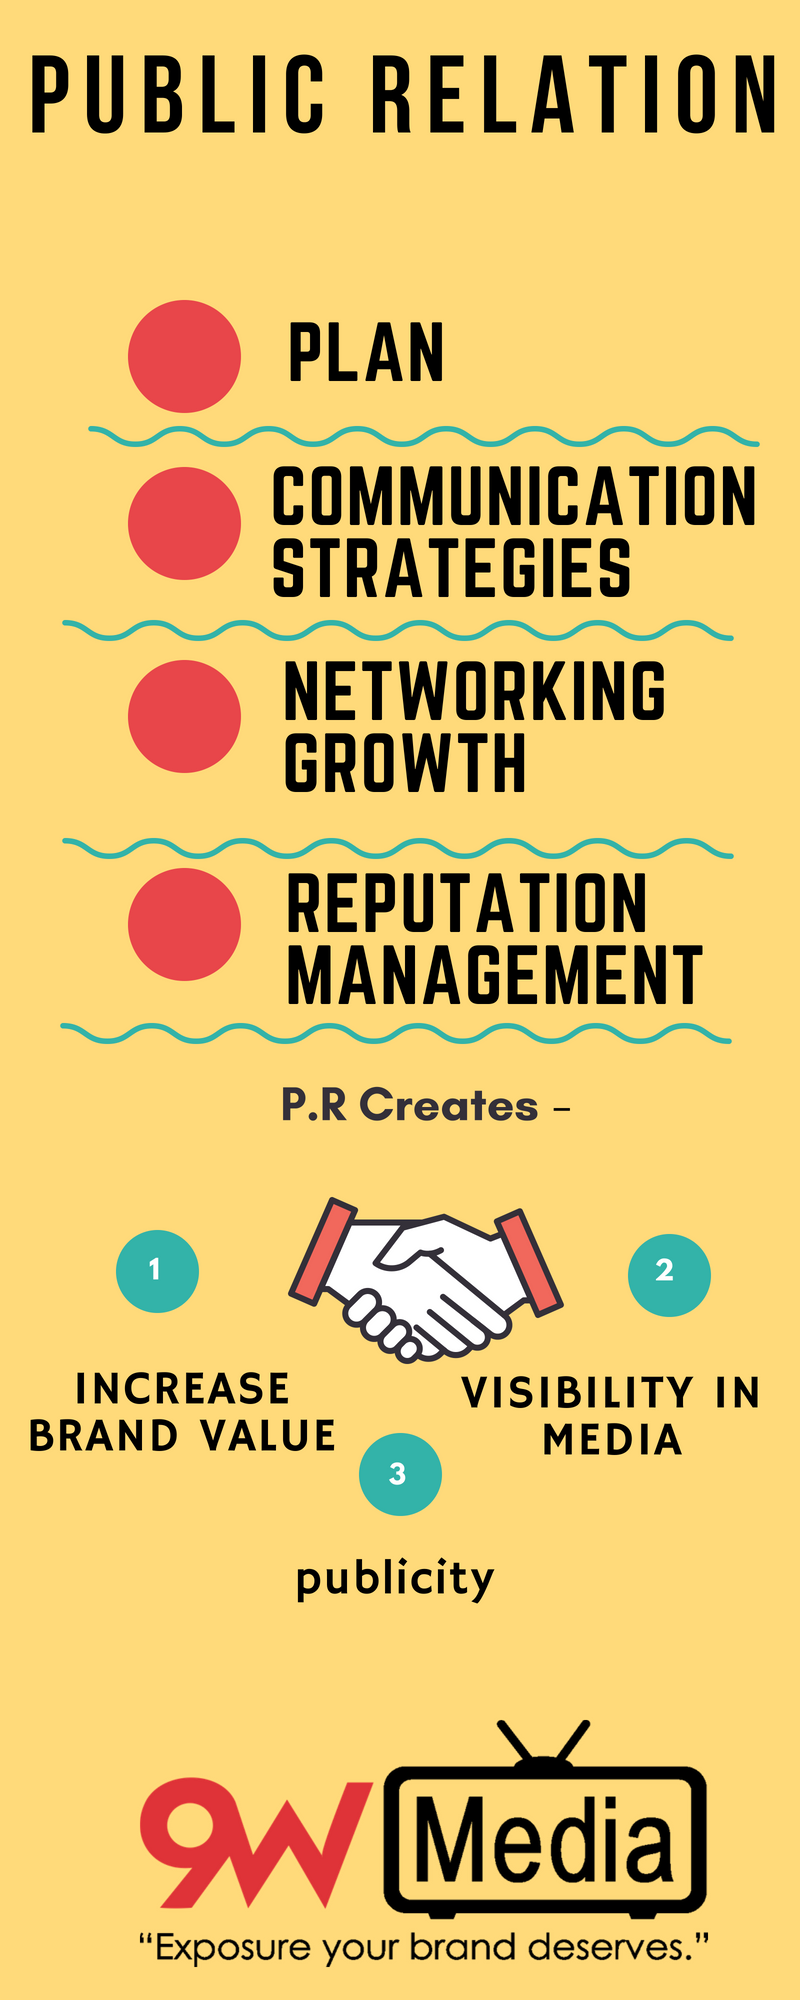 9wMedia is best pr agencies, firms, companies in Pune  The